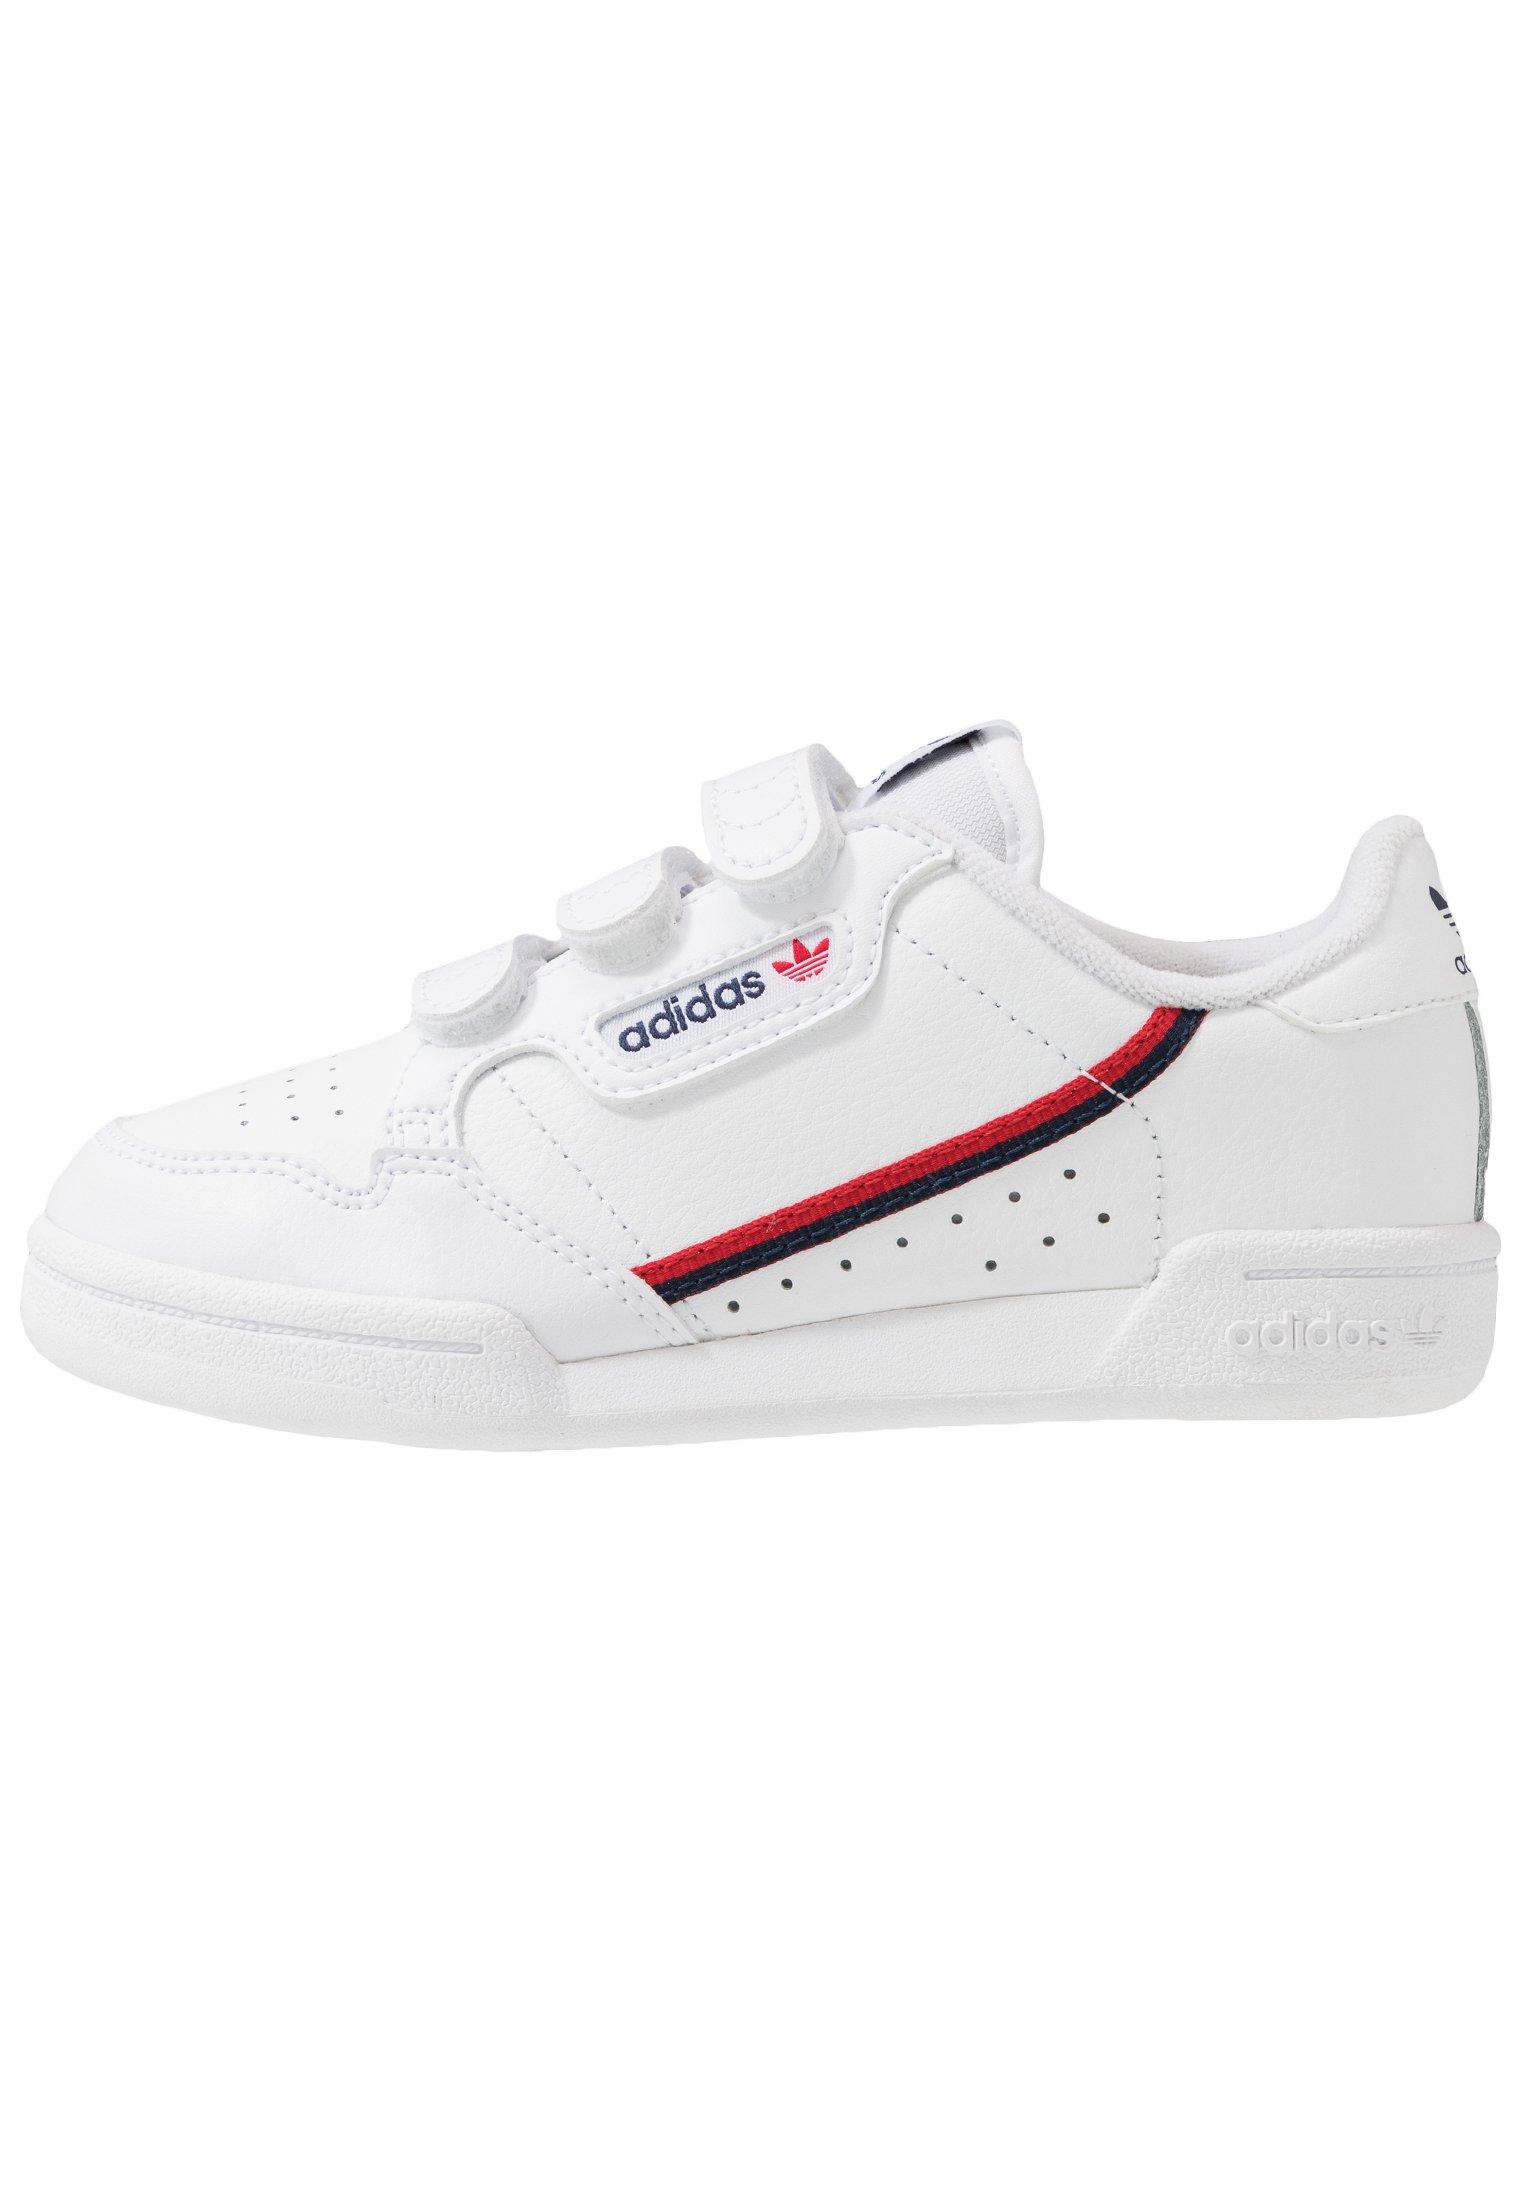 Adidas Originals Continental 80 Sko Footwear WhiteScarlet